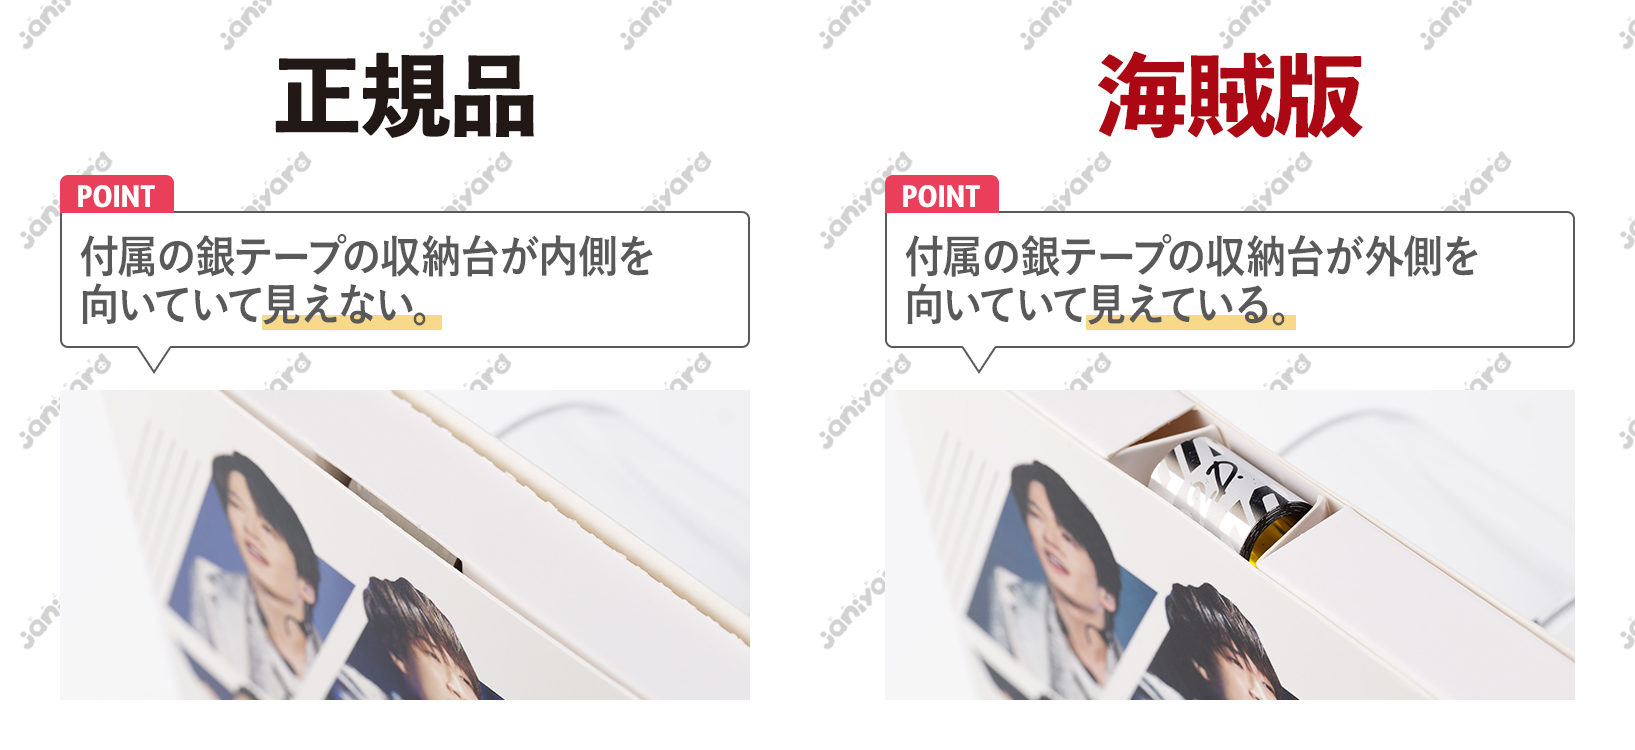 Snow Man ASIA TOUR 2D.2D. 銀テープ 海賊版